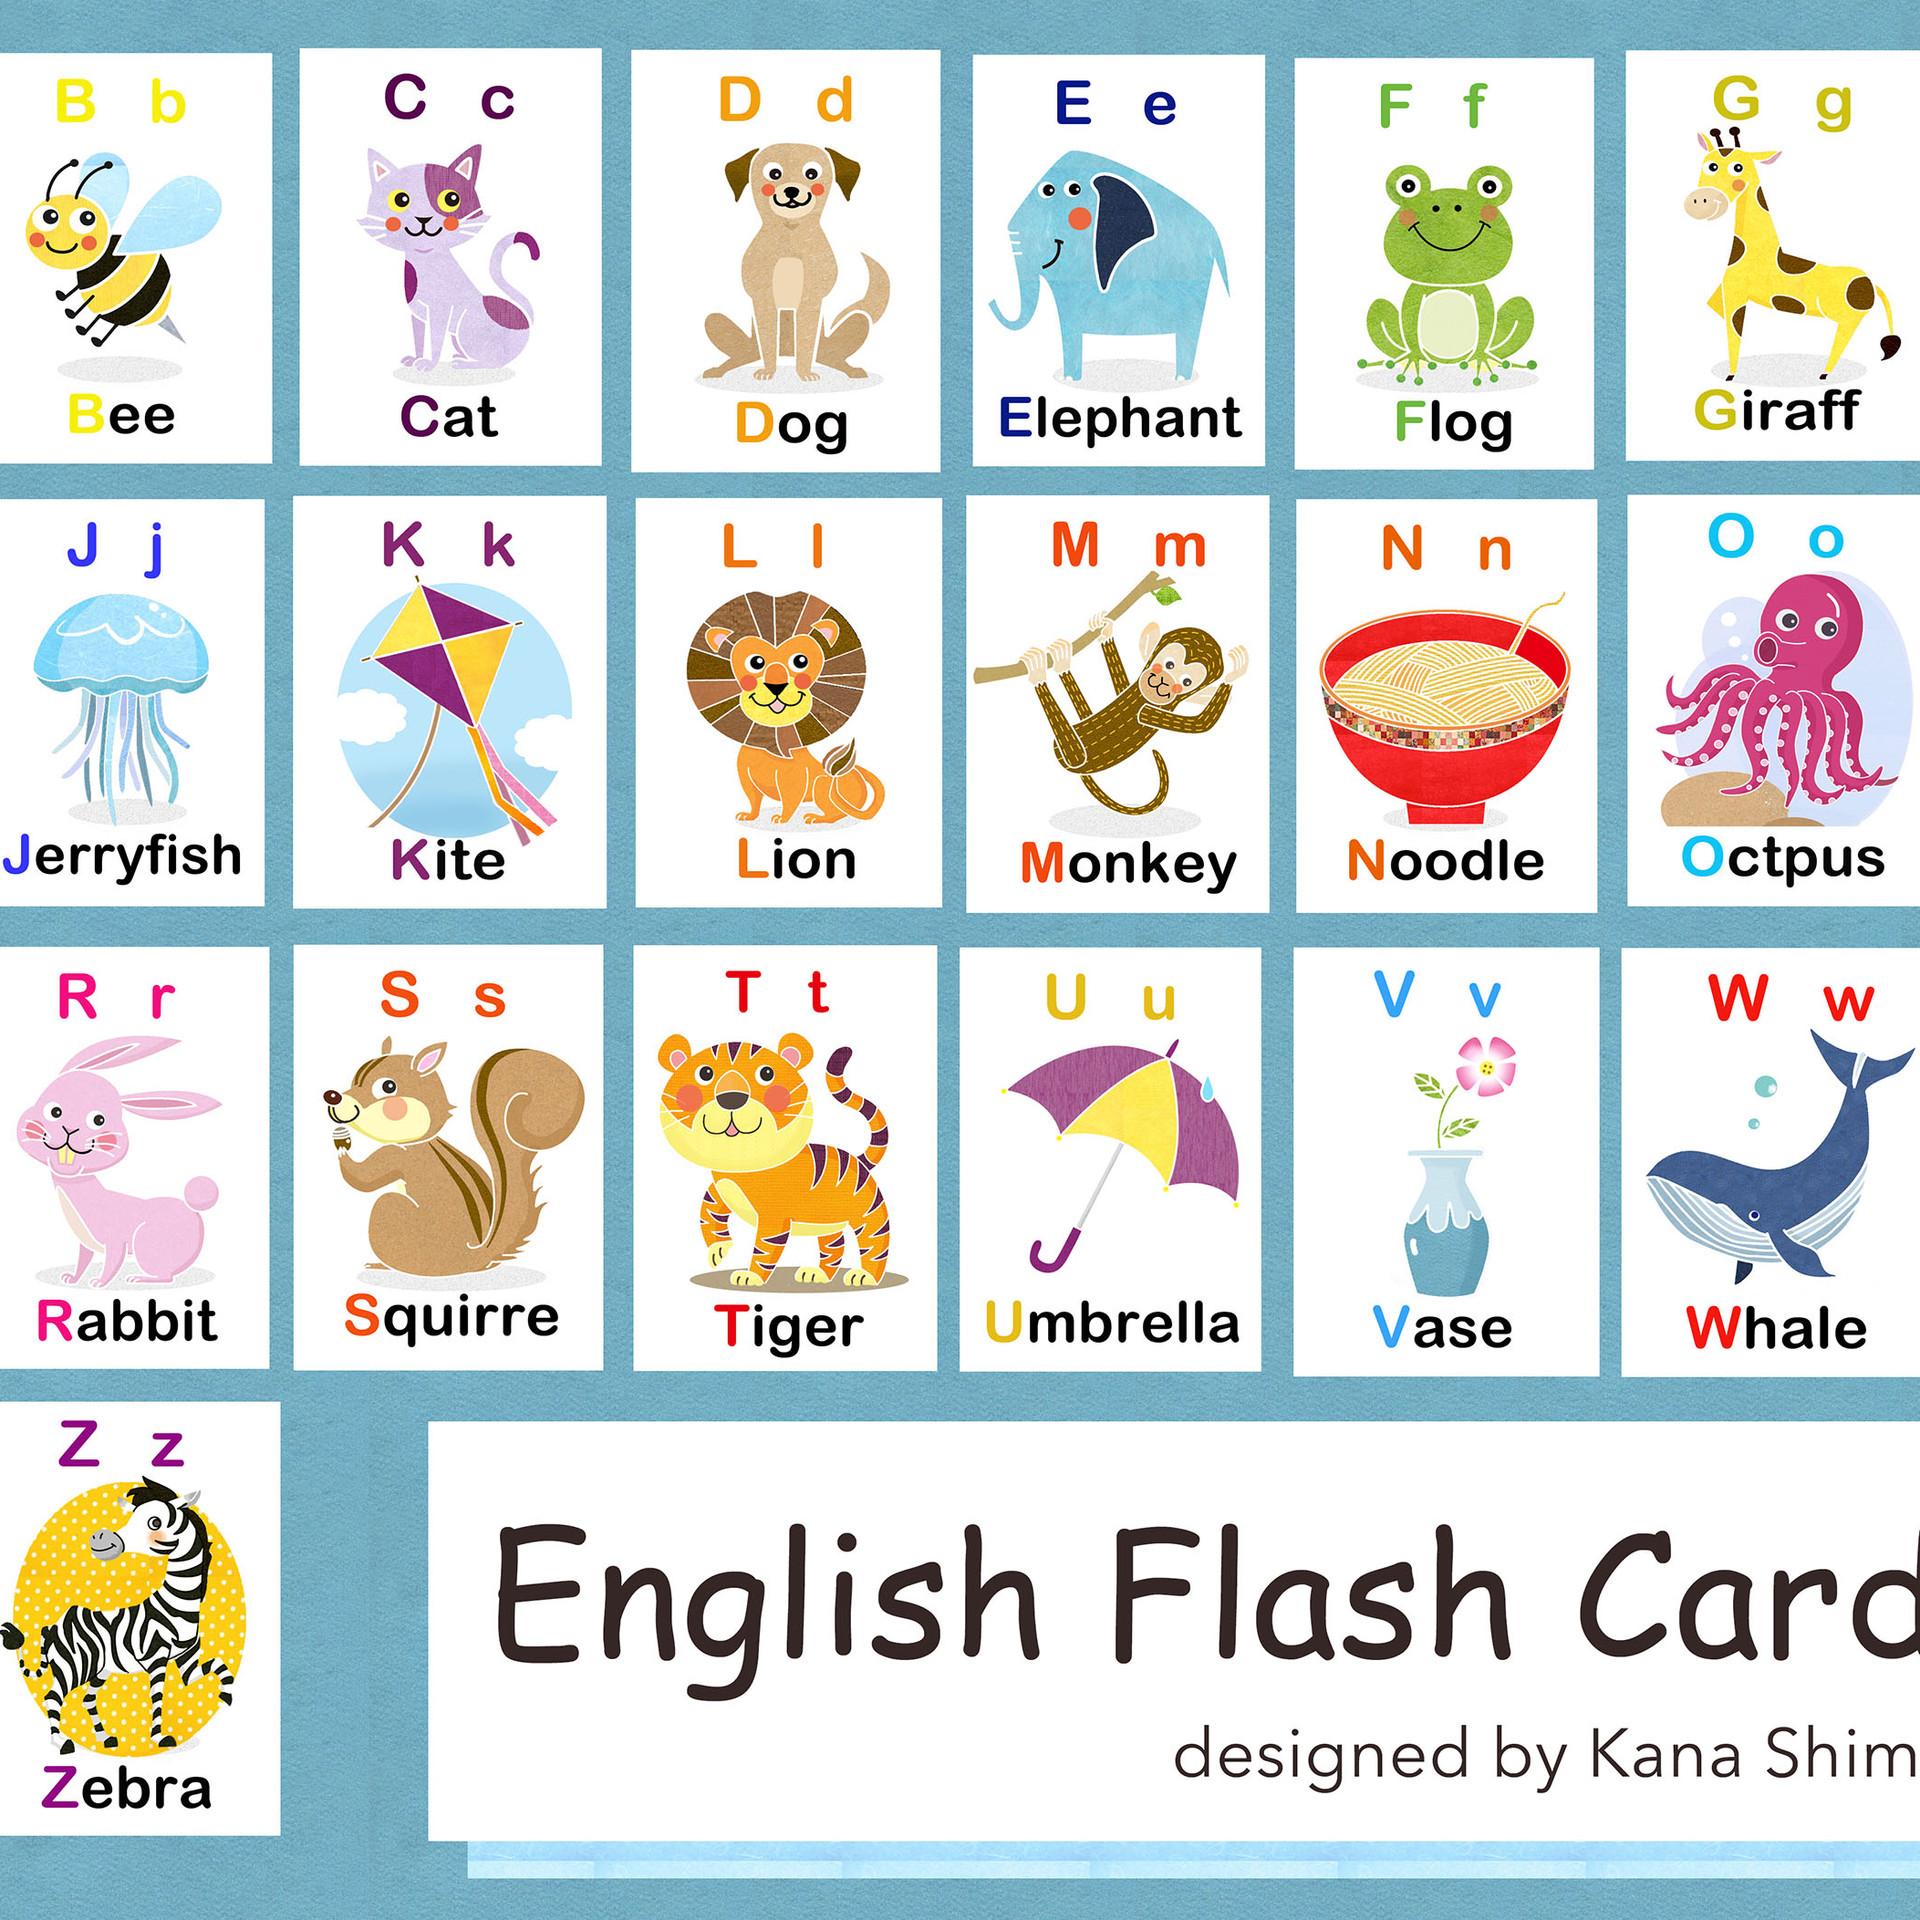 English Flash Cards